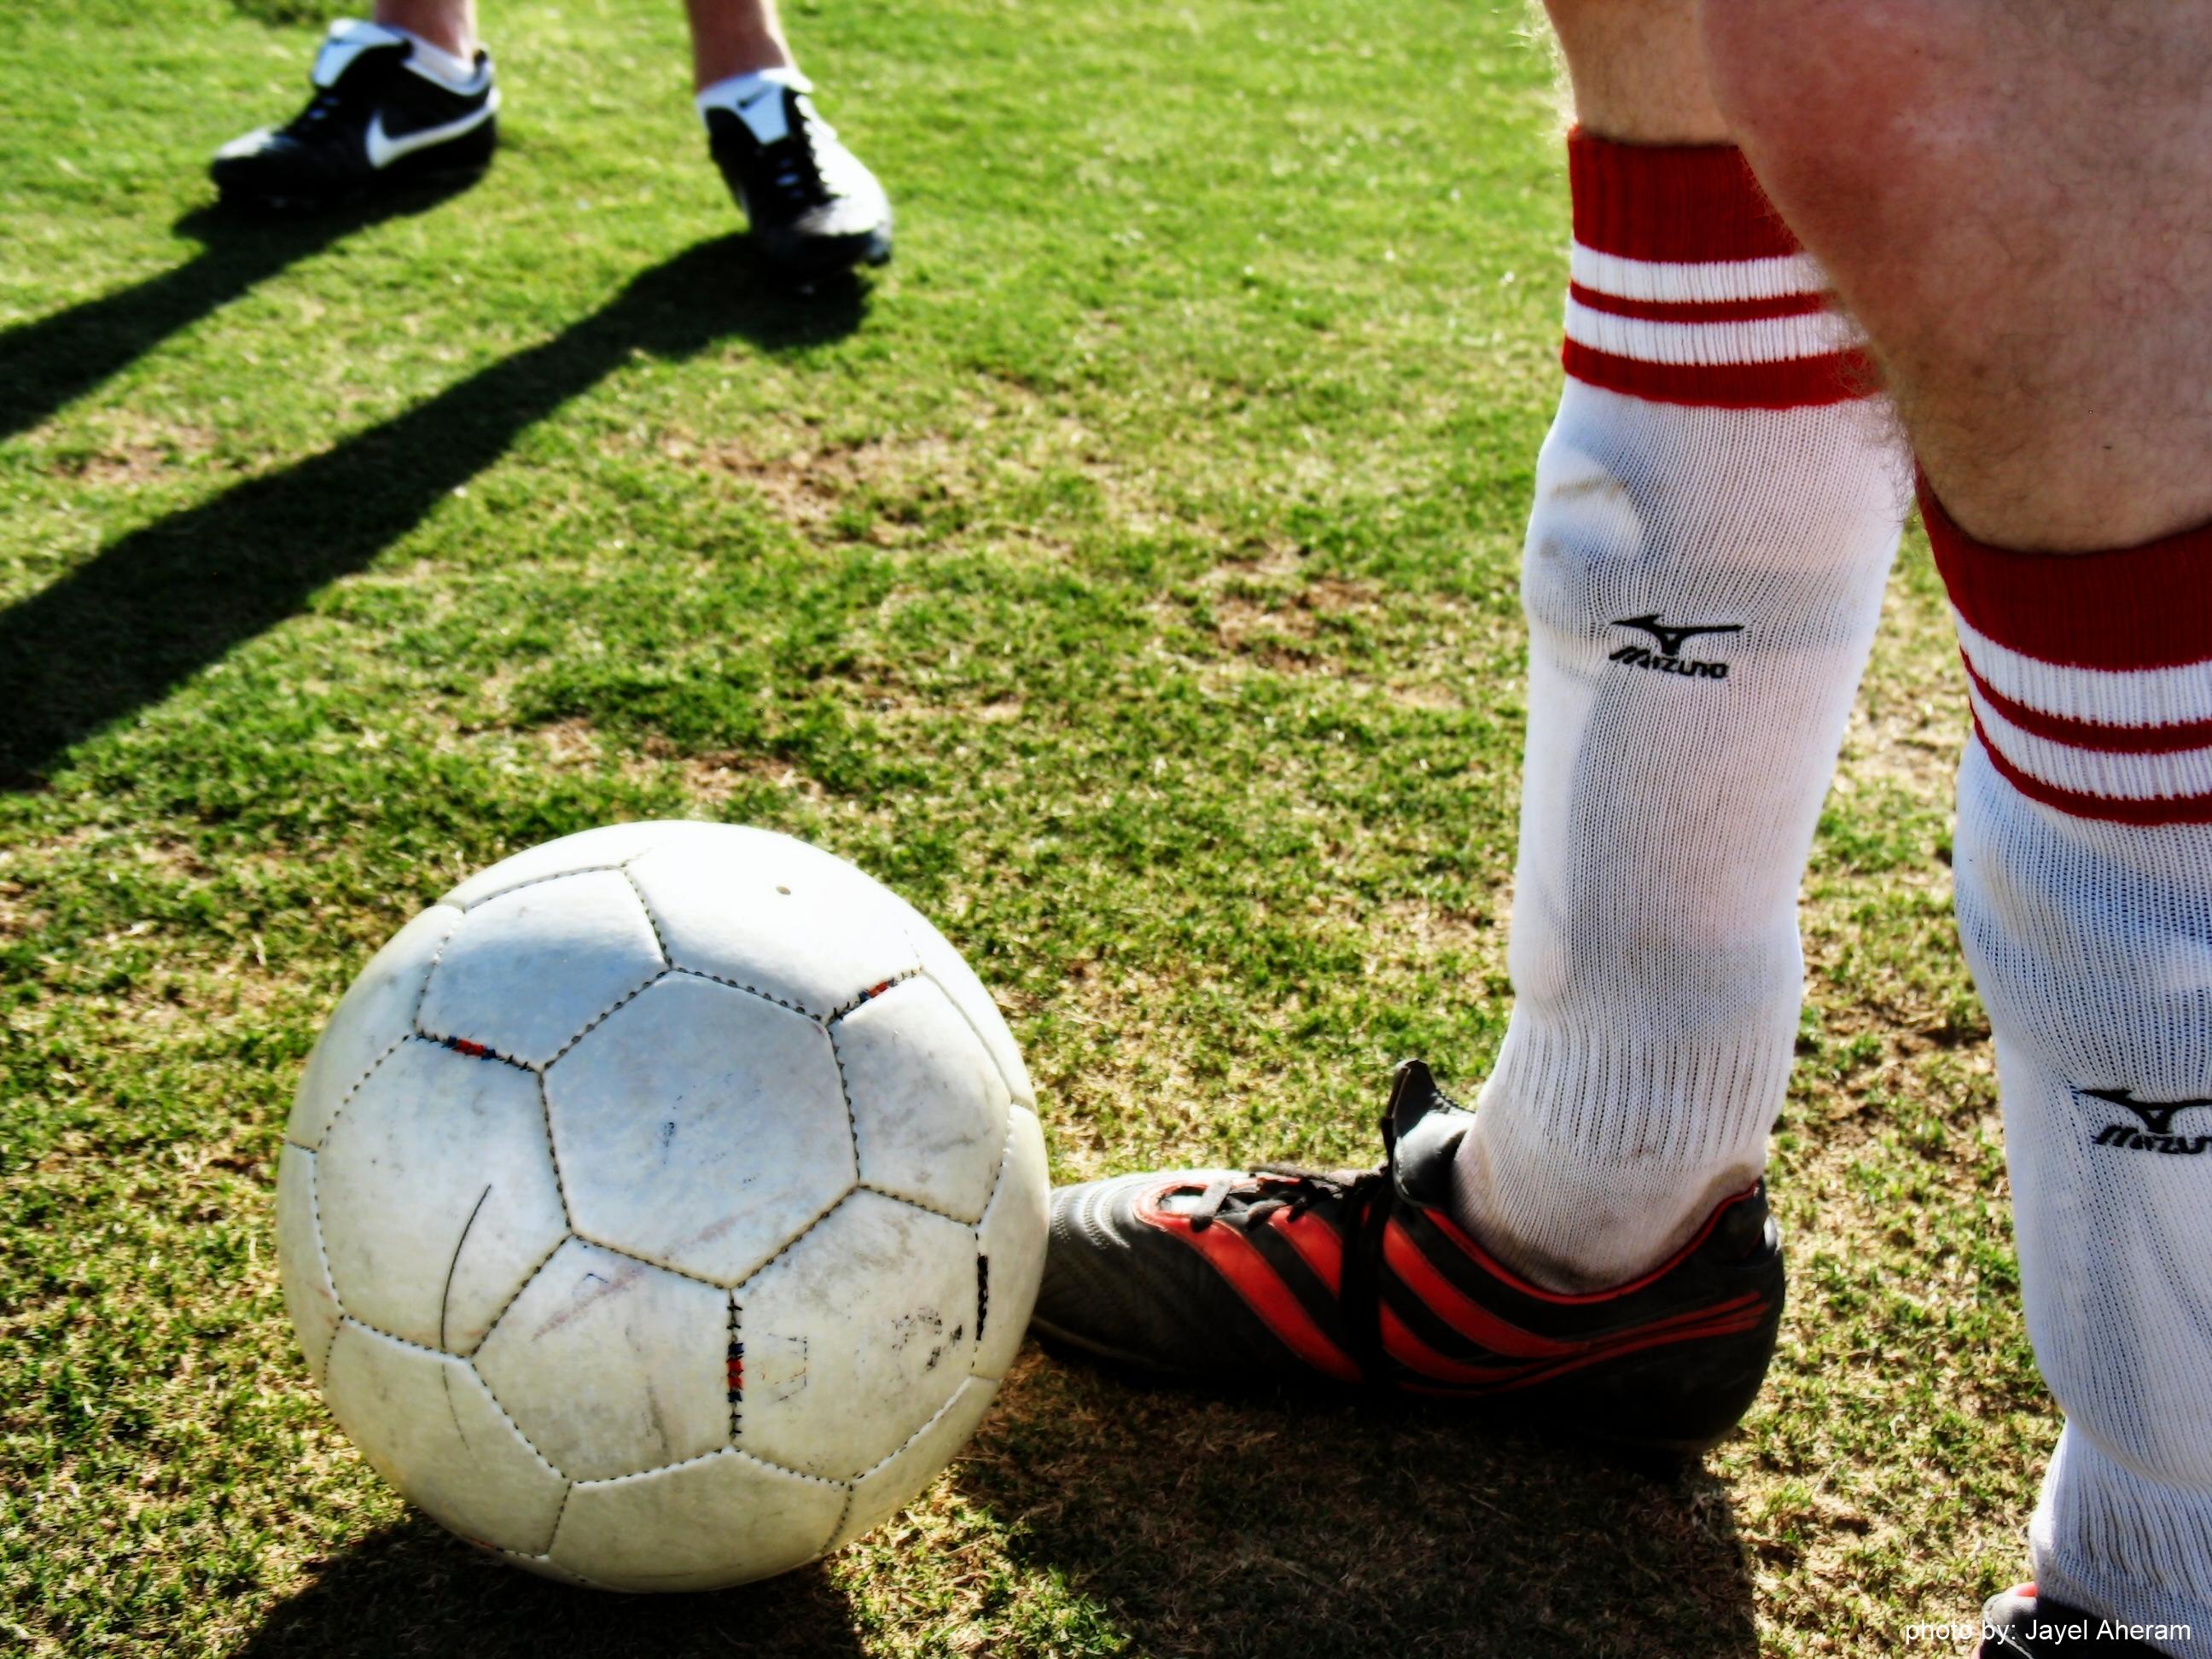 fitness football tips